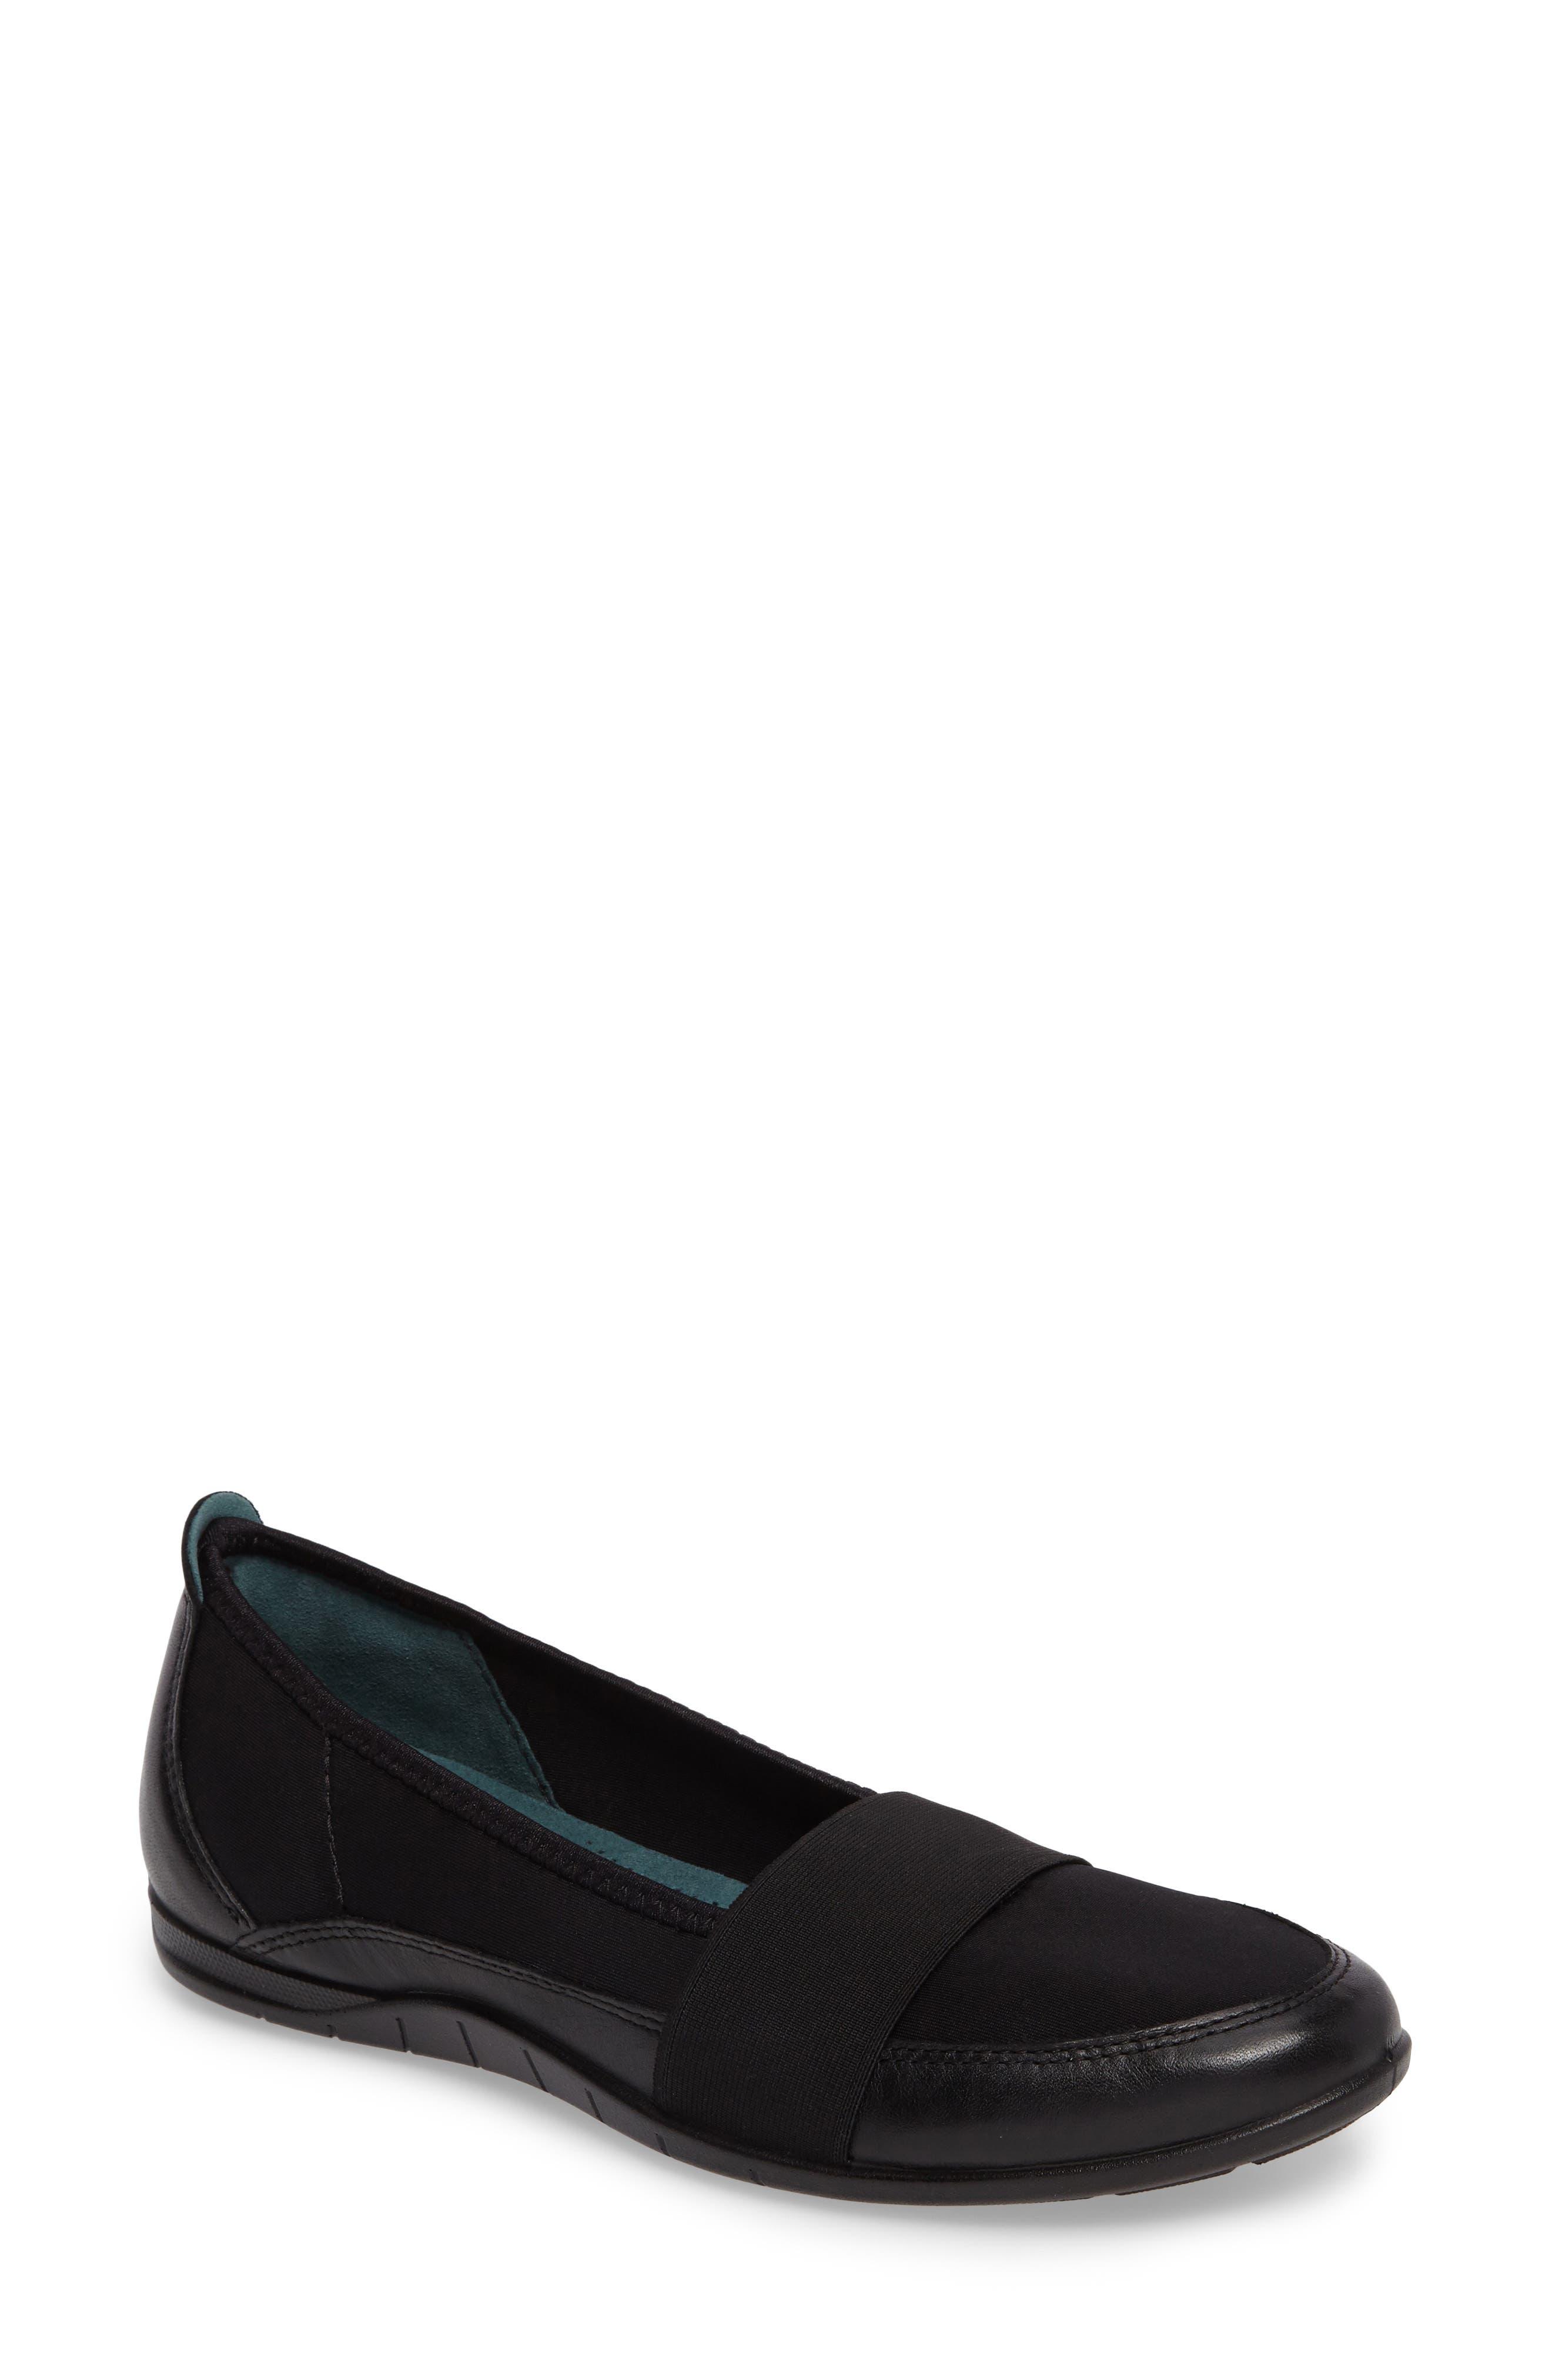 'Bluma' Slip-On Sneaker,                             Main thumbnail 1, color,